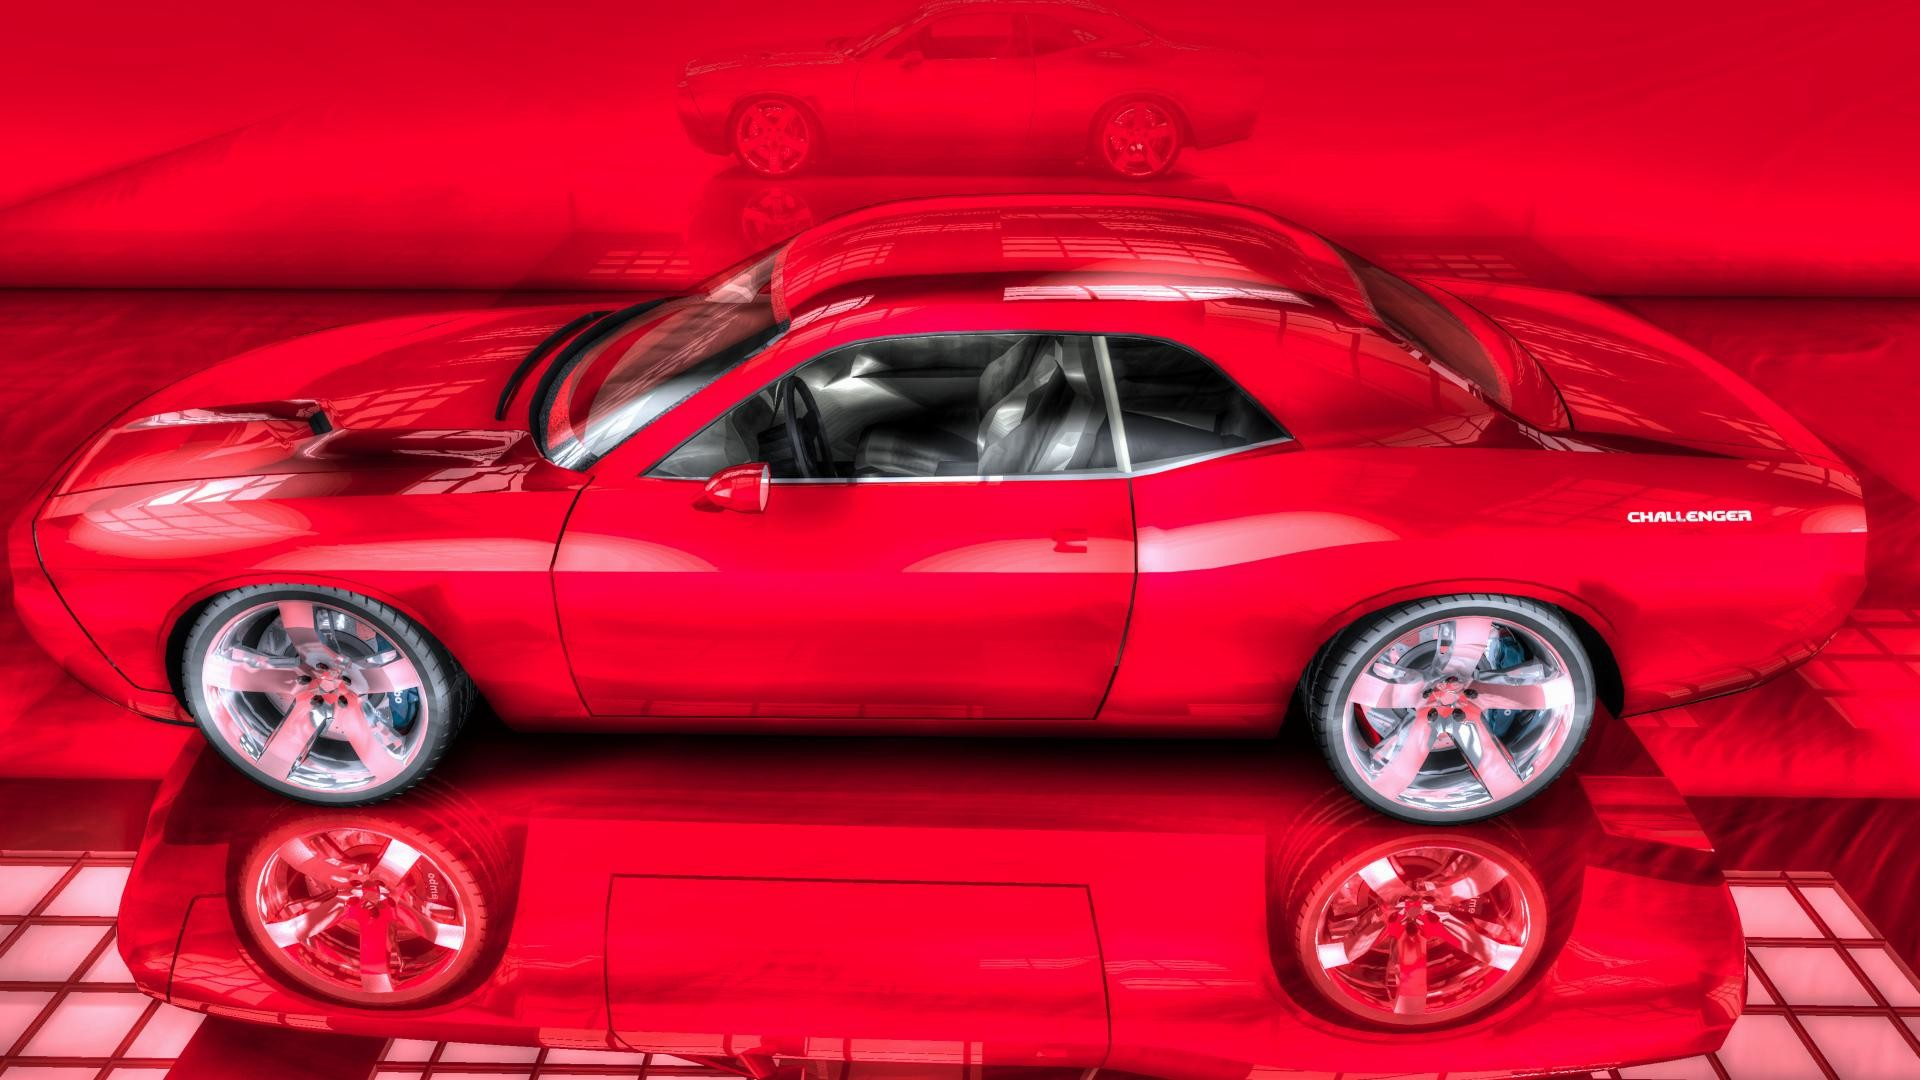 Dodge-Charger-Full-Screen-HD-Wallpaper